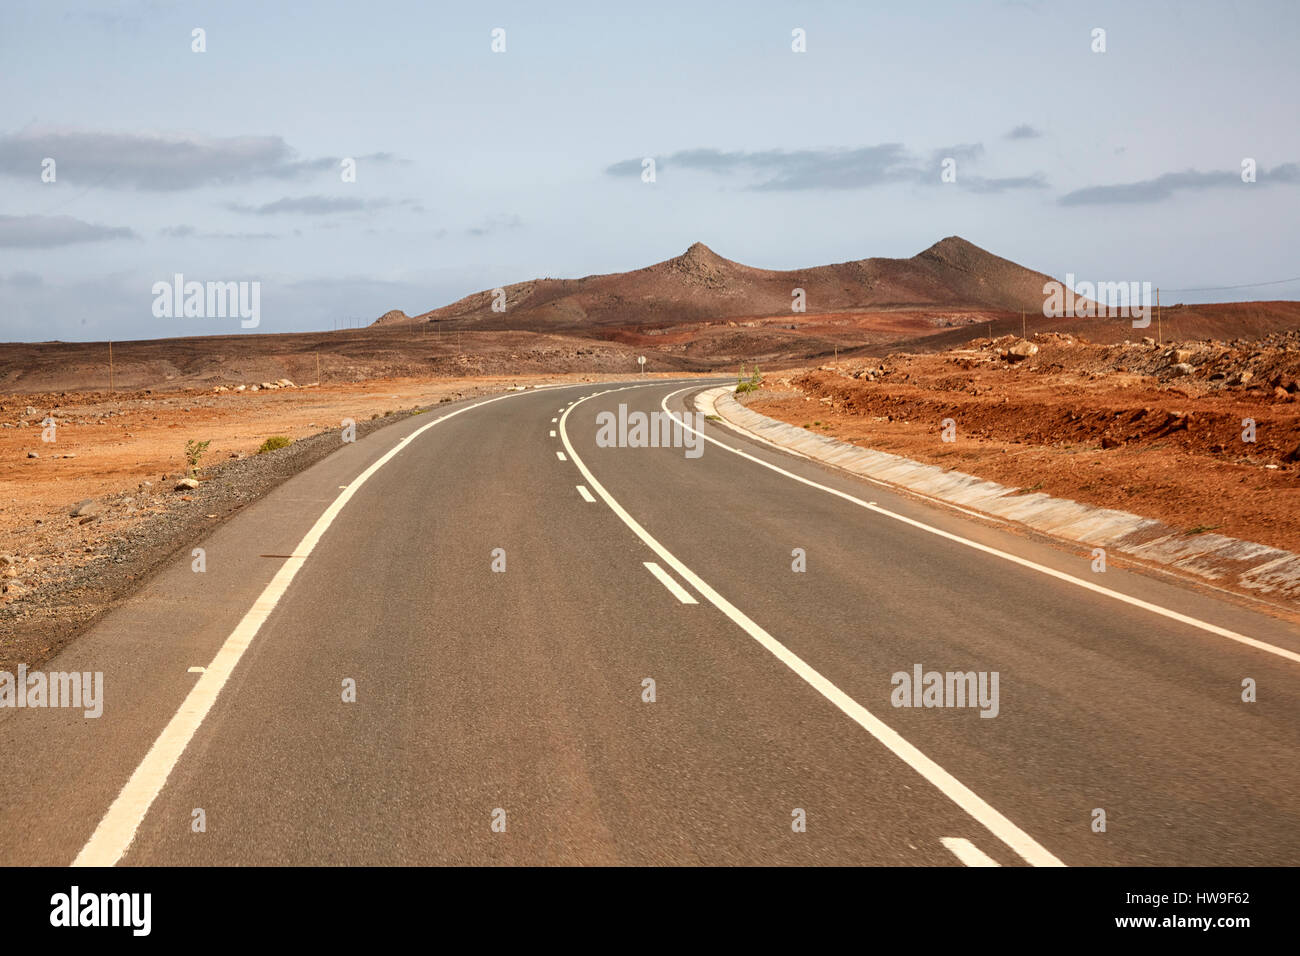 Tarmac road on Boa Vista Island, Cape Verde (Cabo Verde), Africa - Stock Image